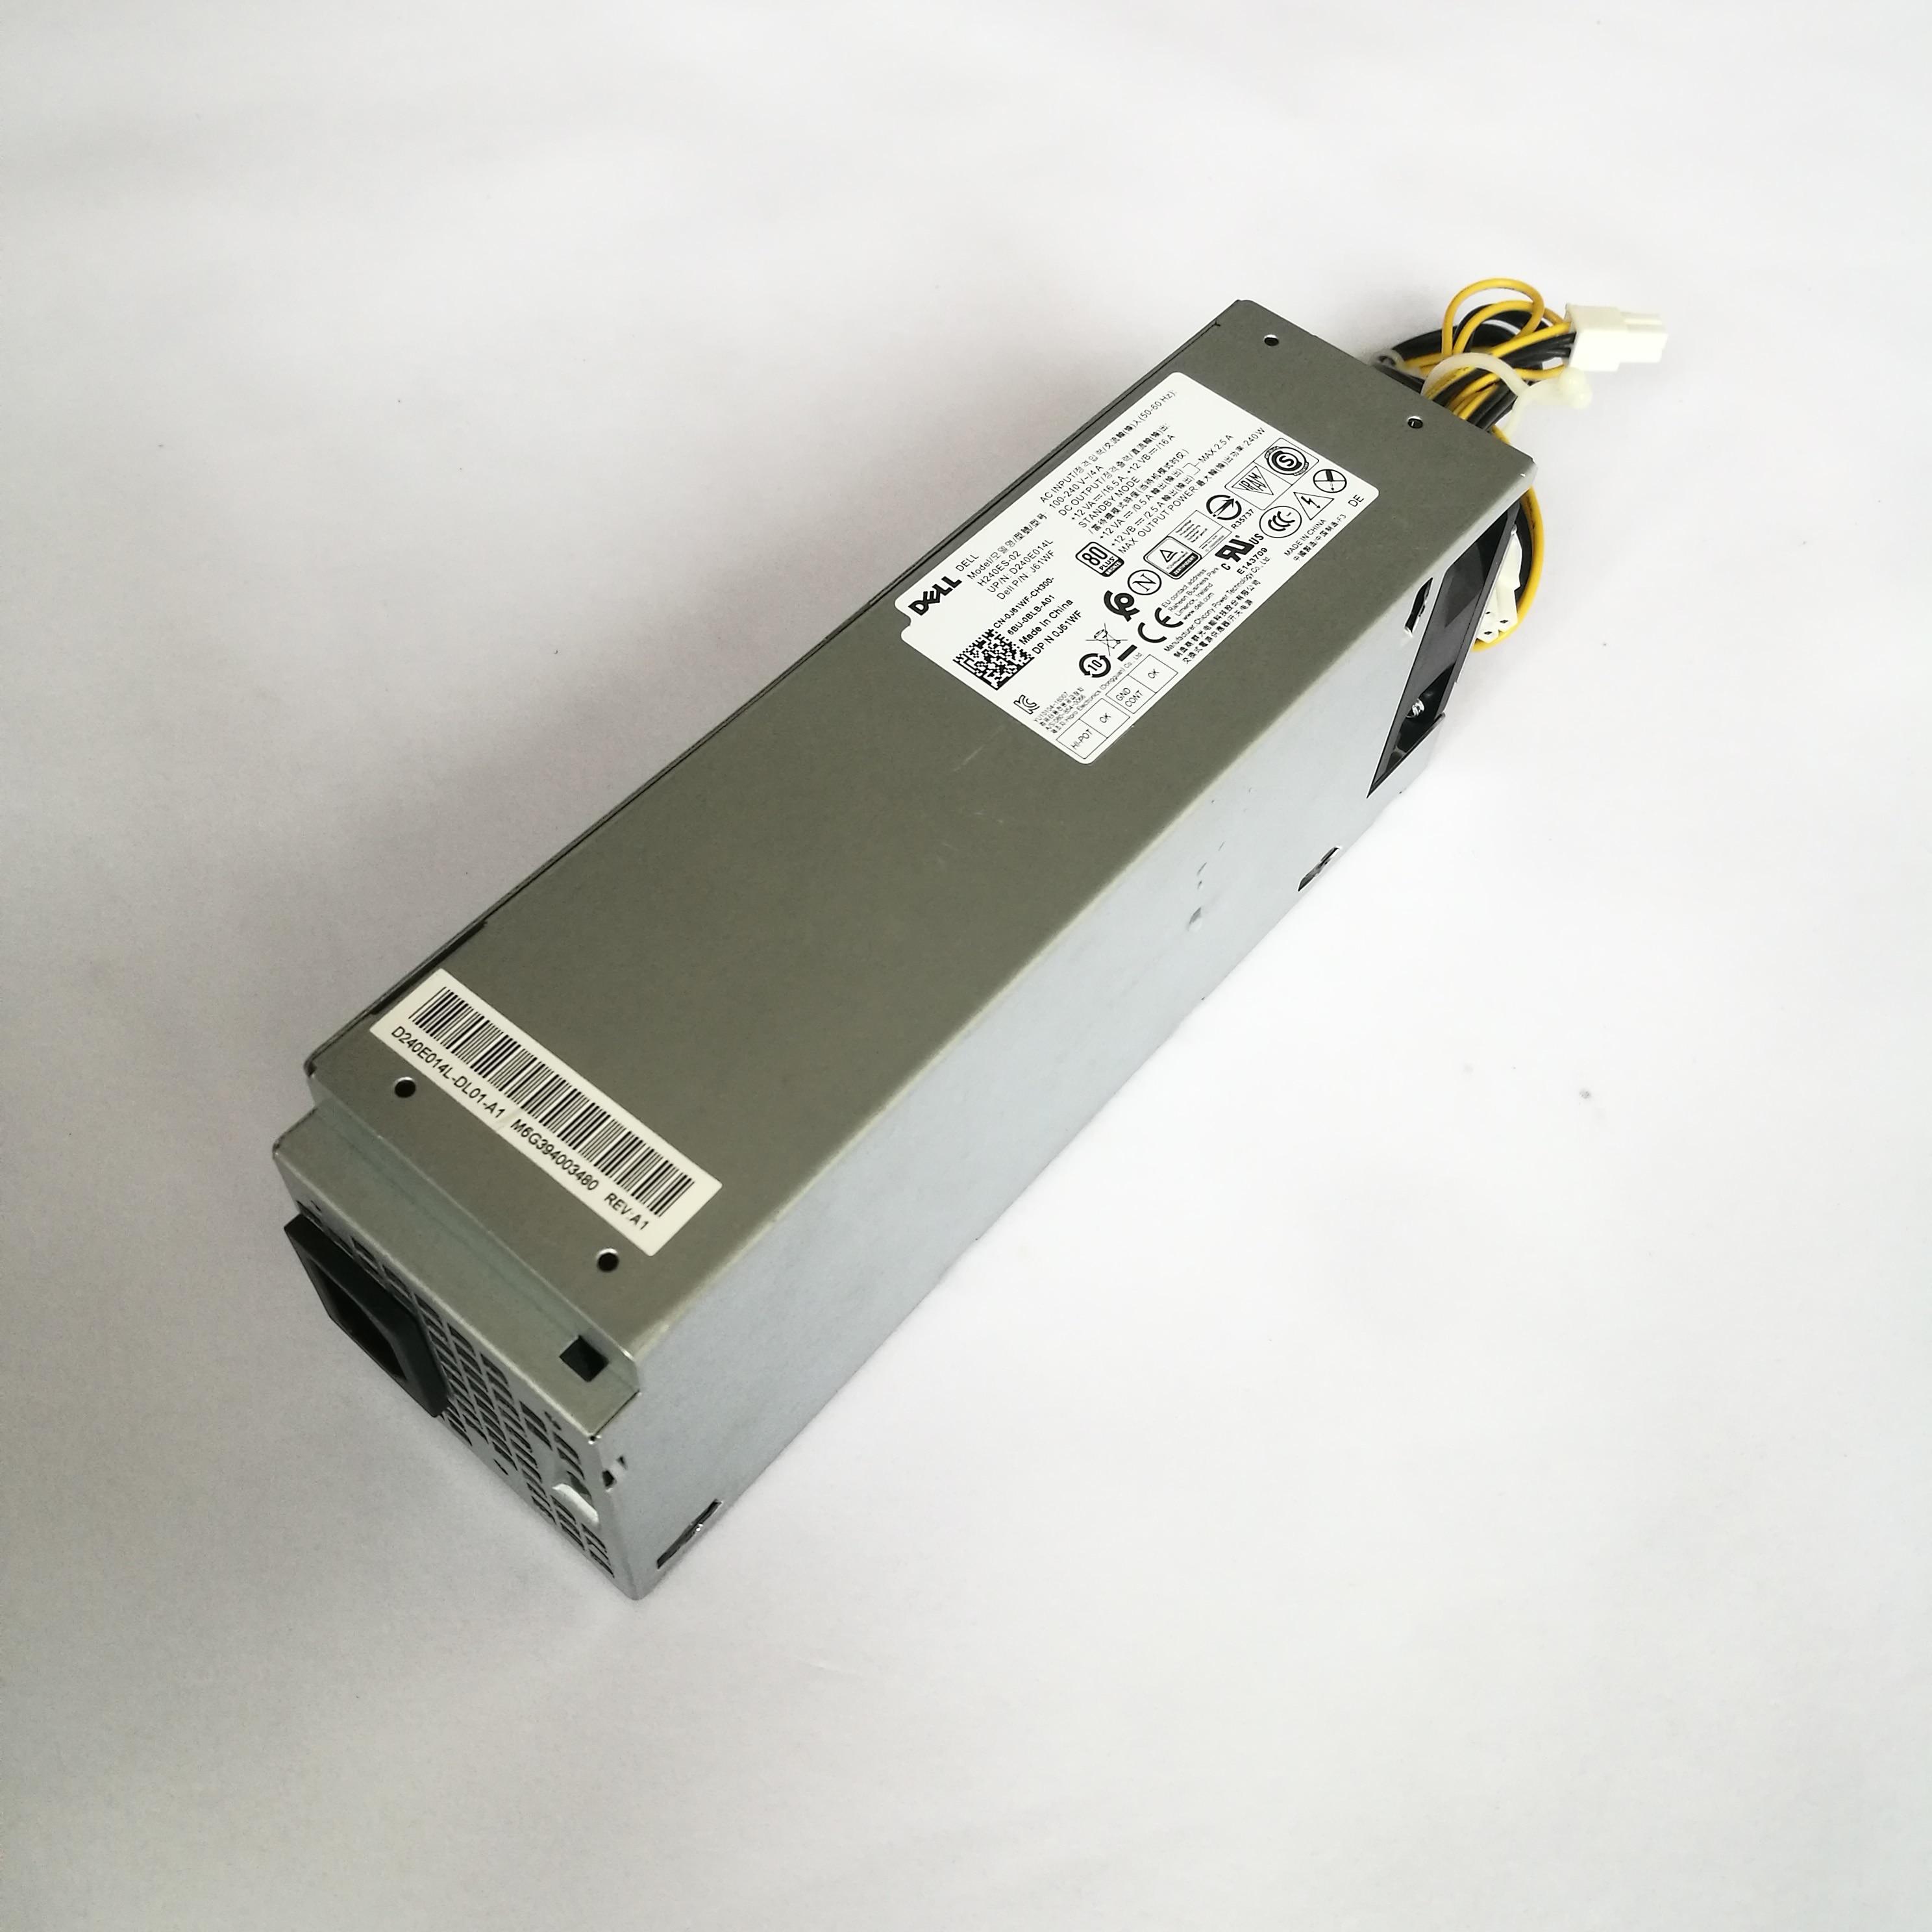 Новый THRJK 0THRJK DHVJN 0DHVJN 2P1RD 02P1RD CN-02P1RD 240W для Dell Optiplex 3040 5040 7040 3650 3656 4pin + 8pin с волокнно-Оптической вилкой Питание